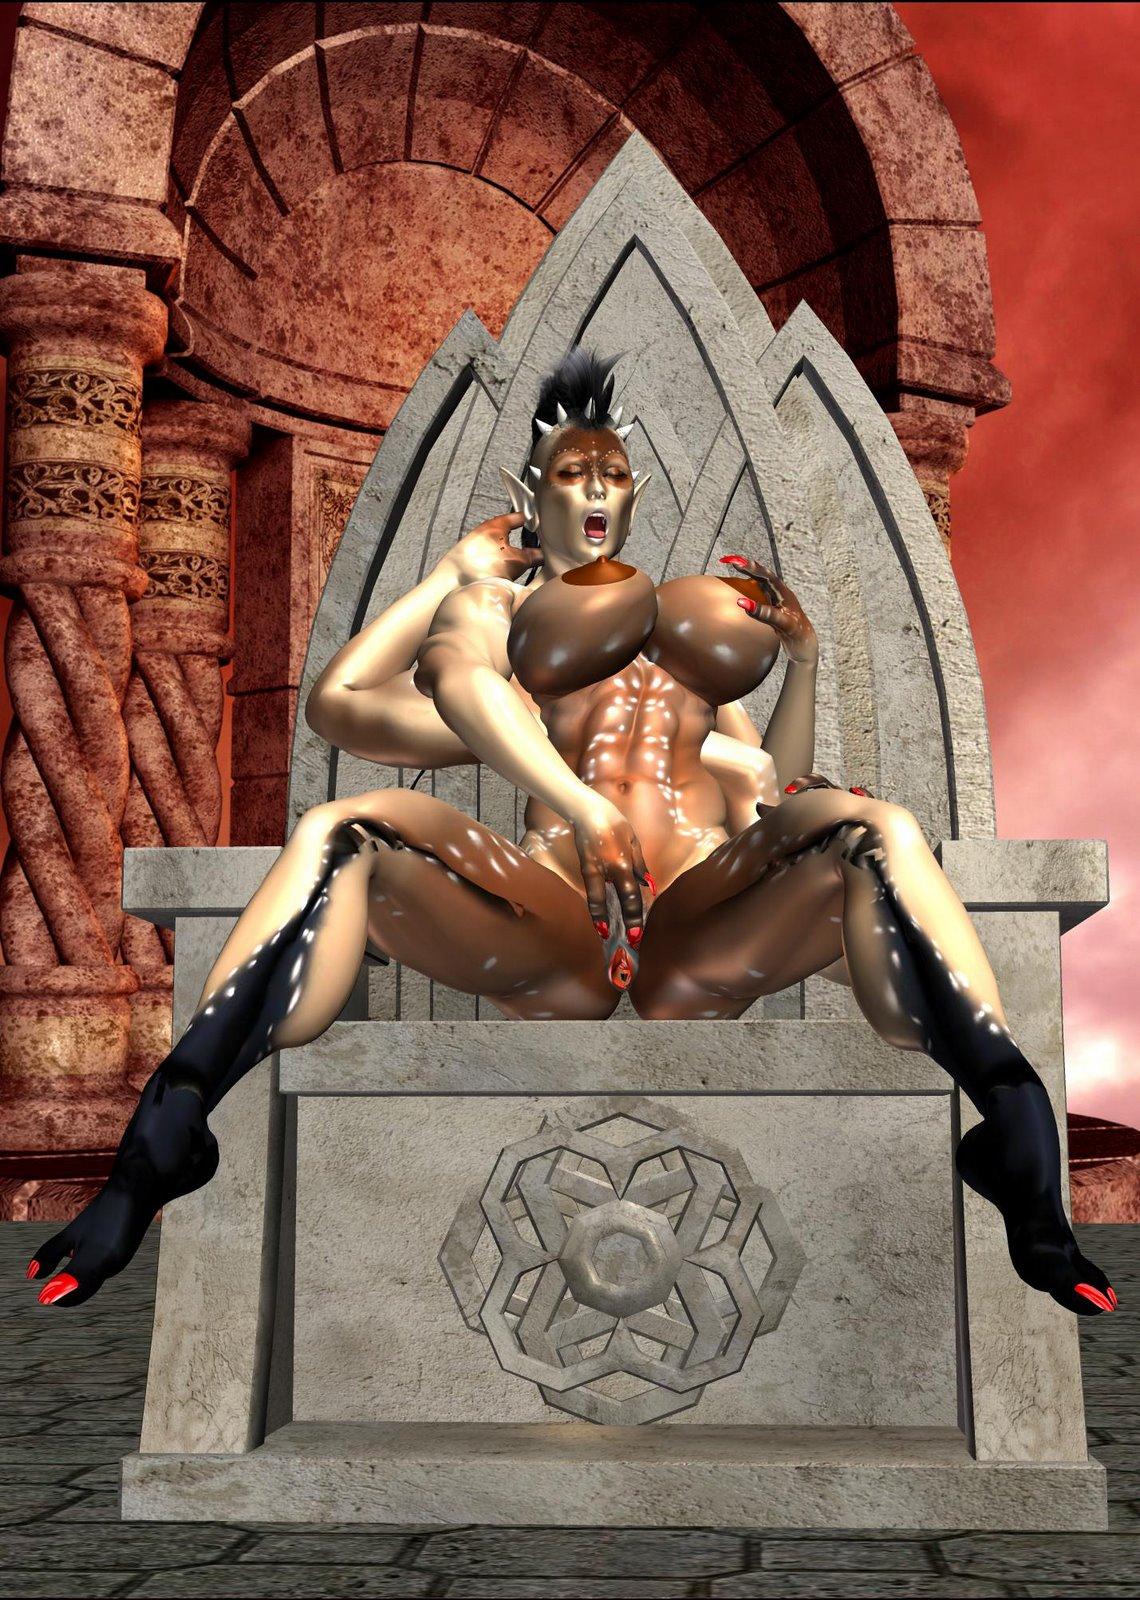 Mortal kombat sexy hentai armageddon porn galleries